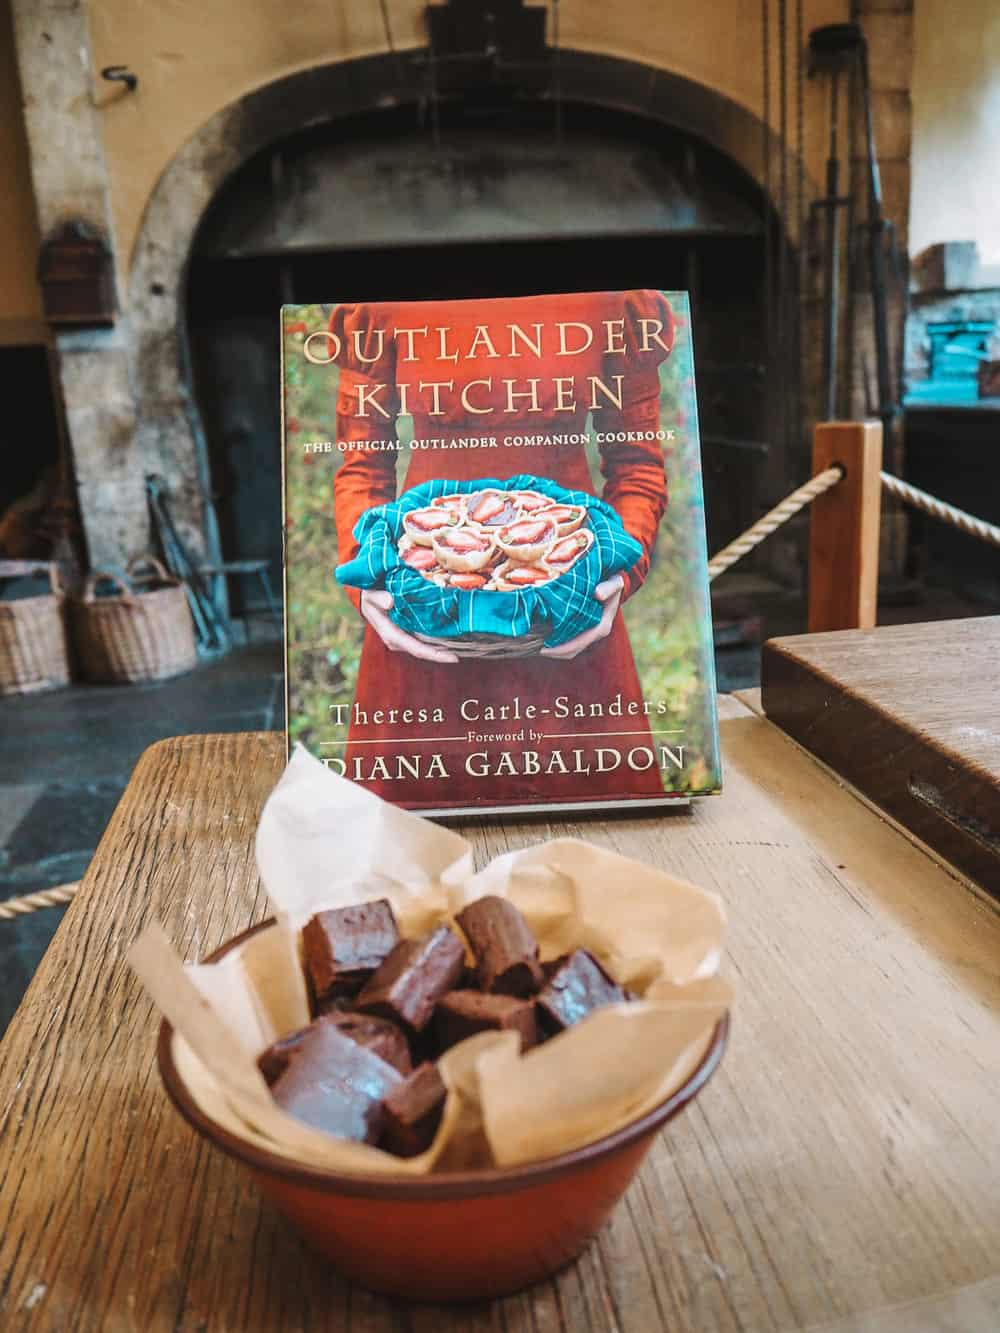 Black Jack Randall's Dark Chocolate Lavender fudge from the Outlander Kitchen cookbook…delicious!